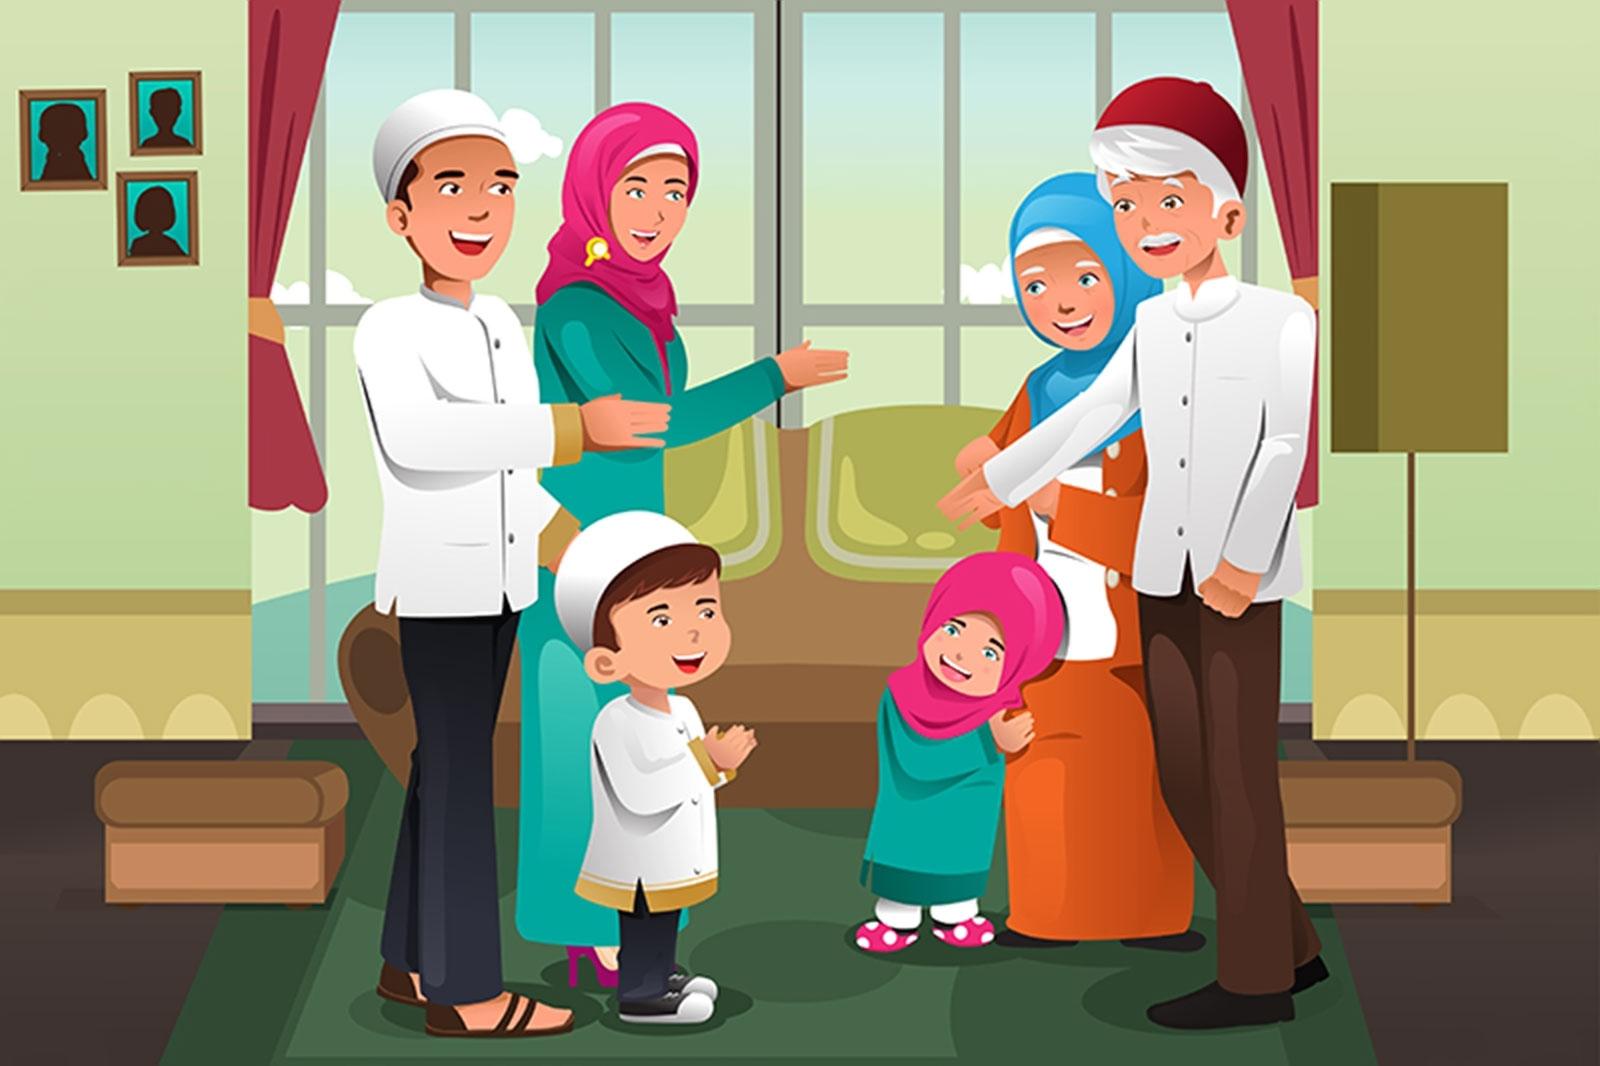 Раджаб, Шаабан, Рамадан - наполняем дом атмосферой праздника